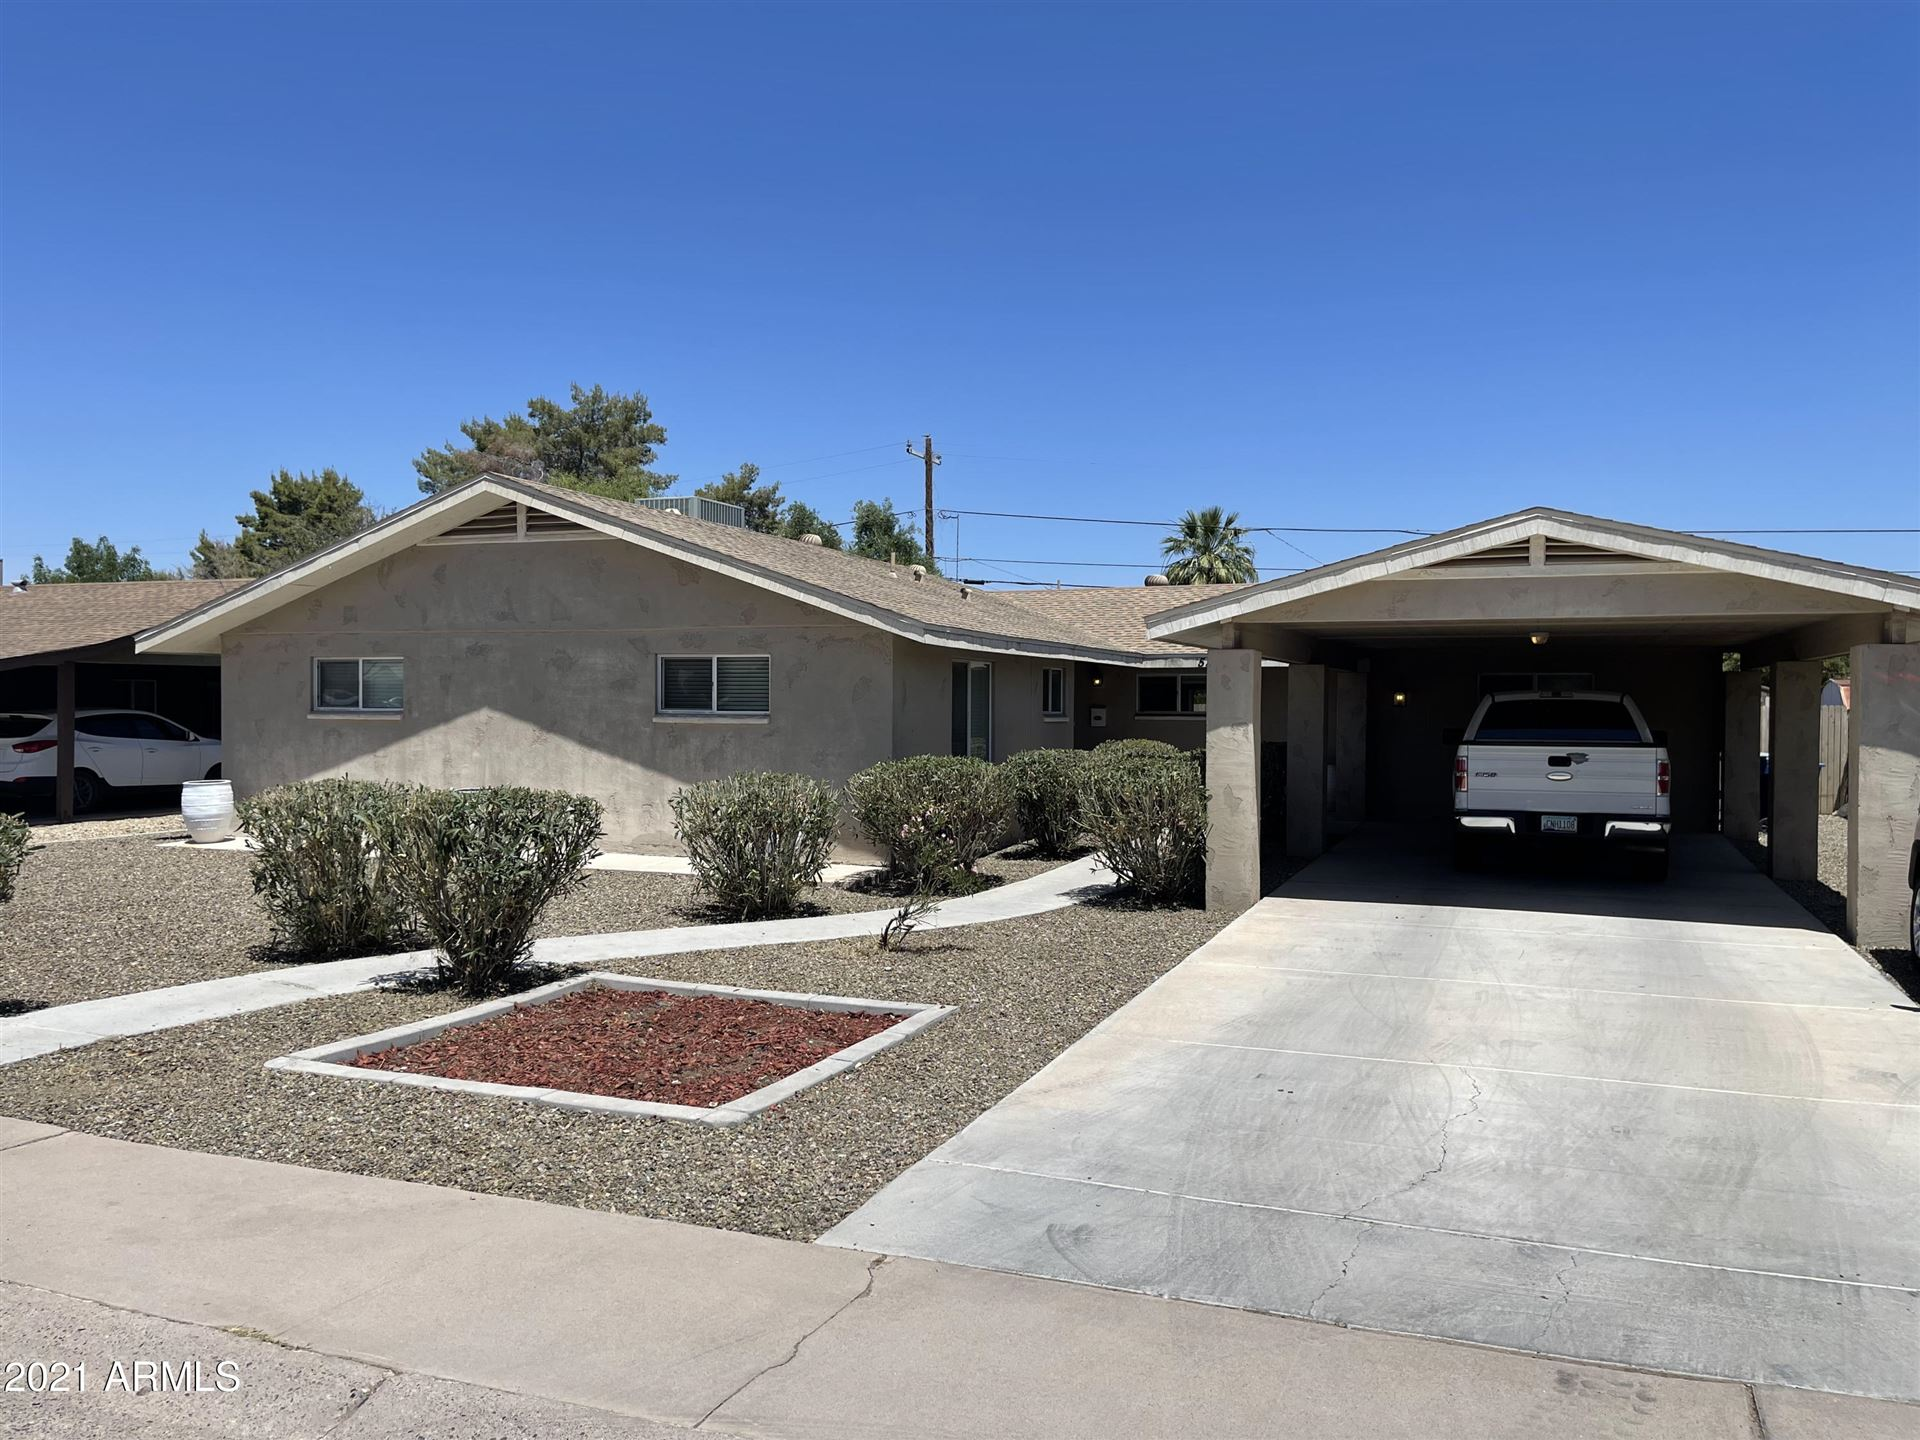 524 W 18TH Street, Tempe, AZ 85281 - MLS#: 6237098